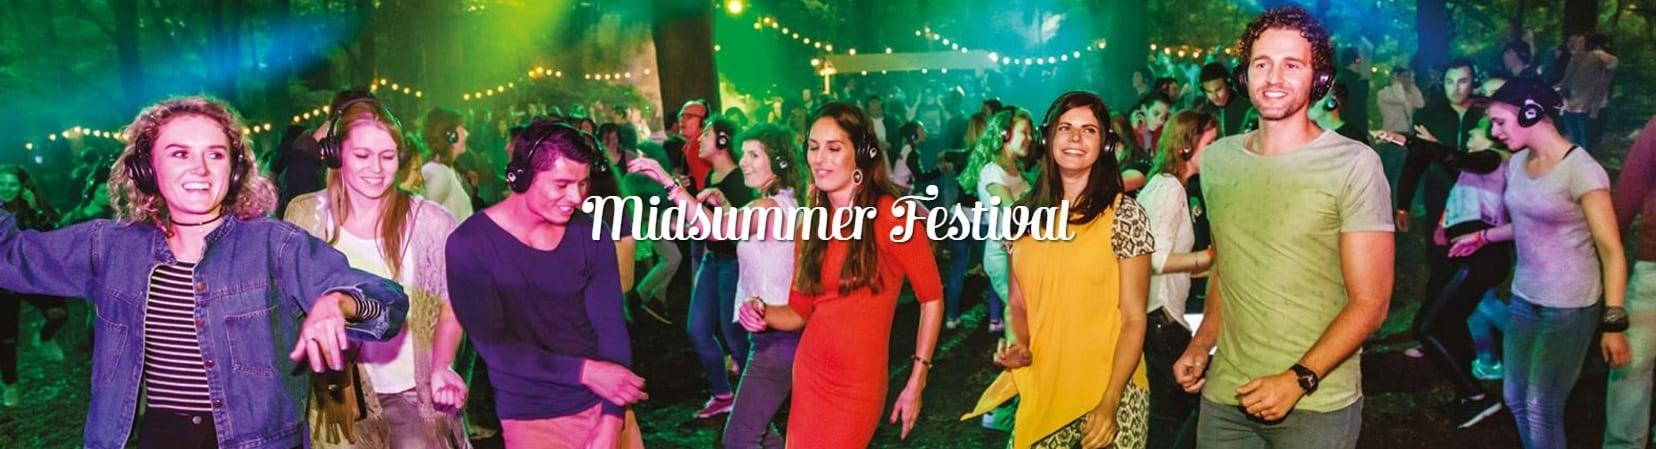 silent-disco-Efteling-2017-midzomernacht-005